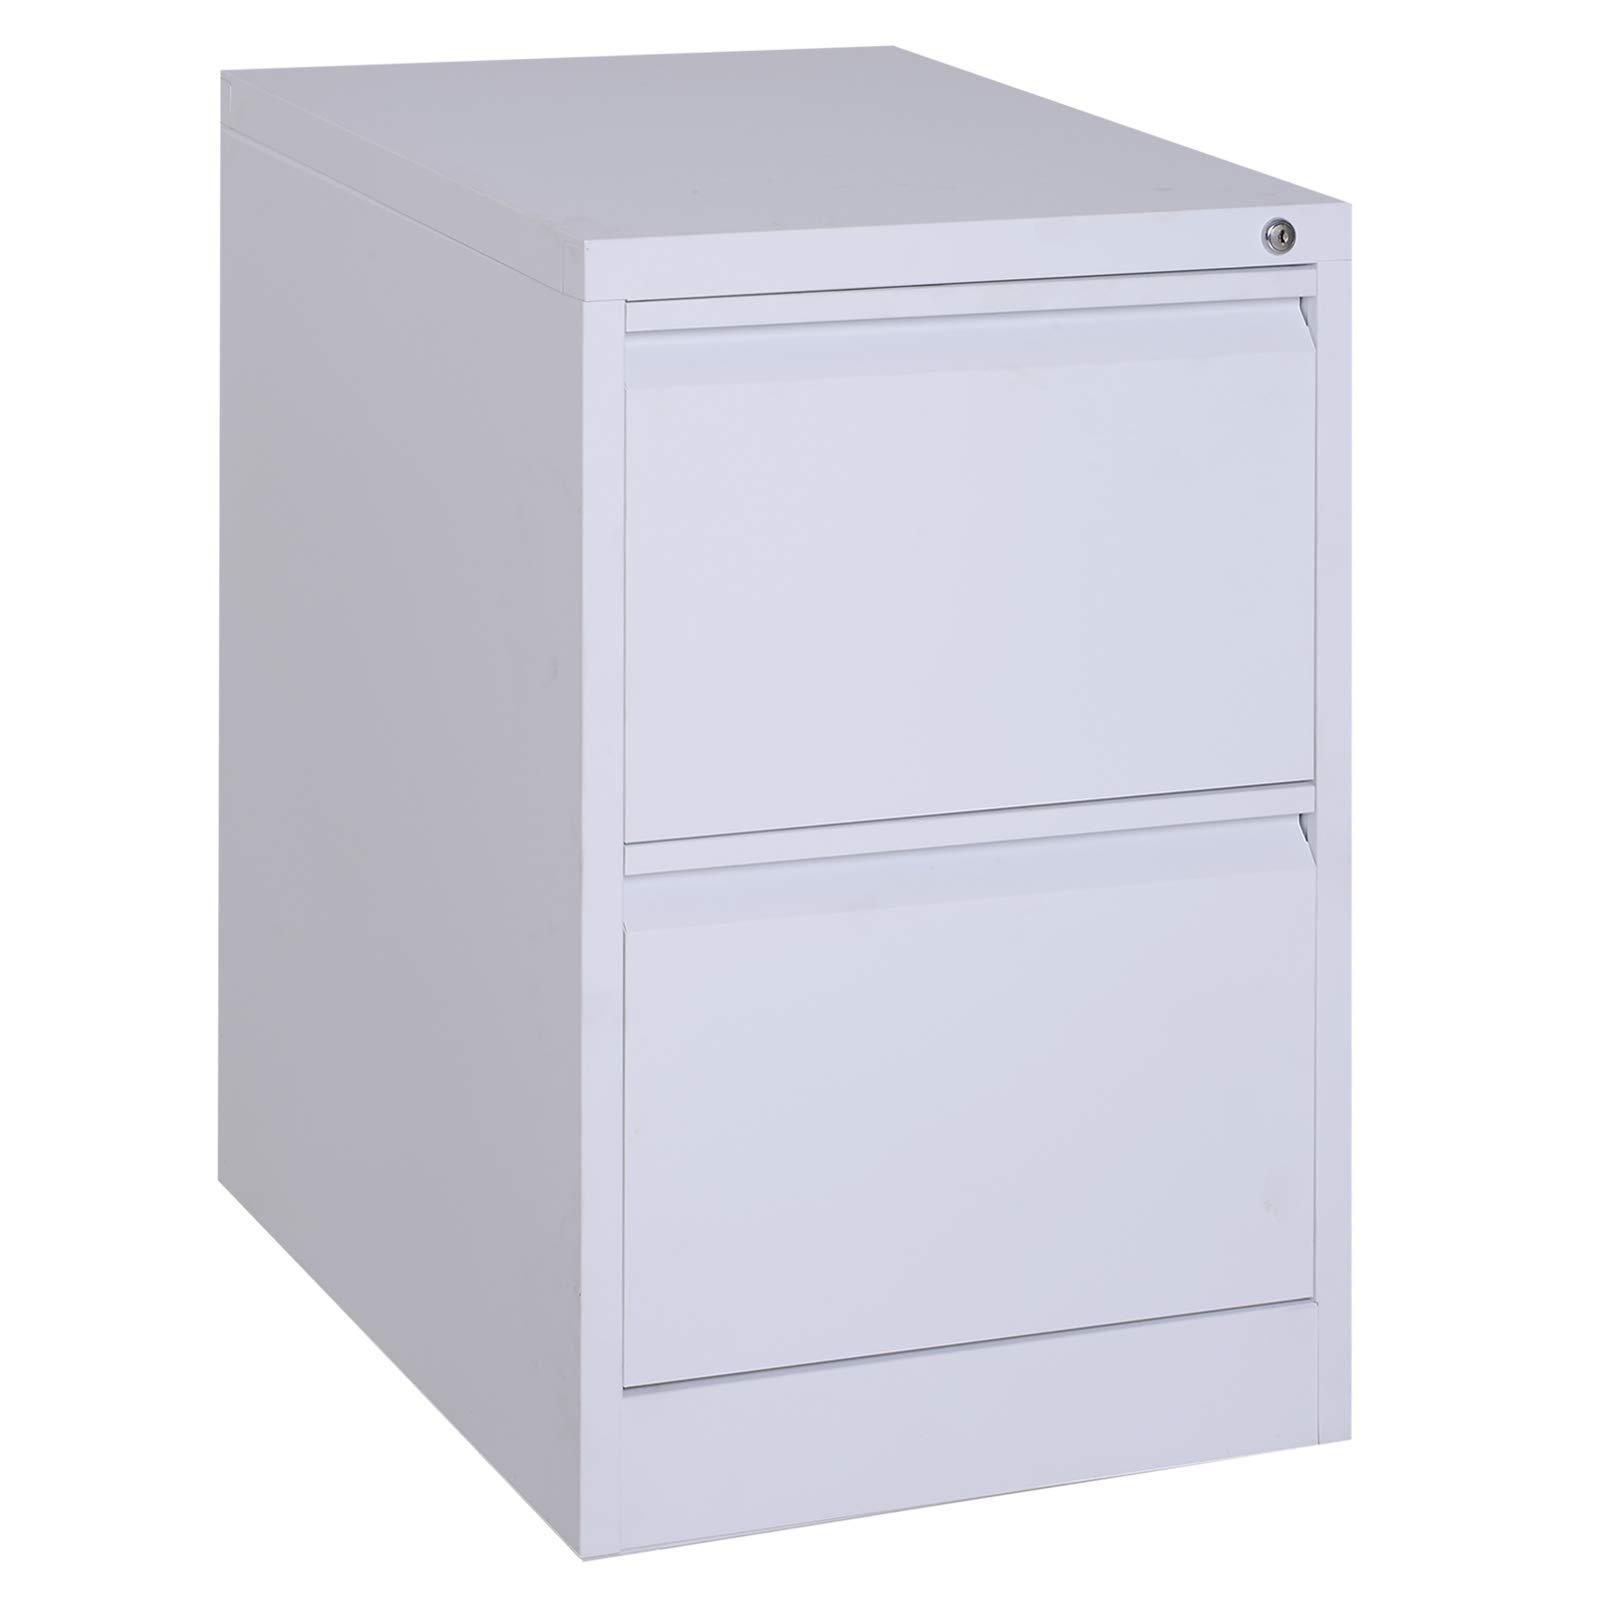 Vinsetto 28'' Metal 2 Drawer Vertical Locking Filing Cabinet - White